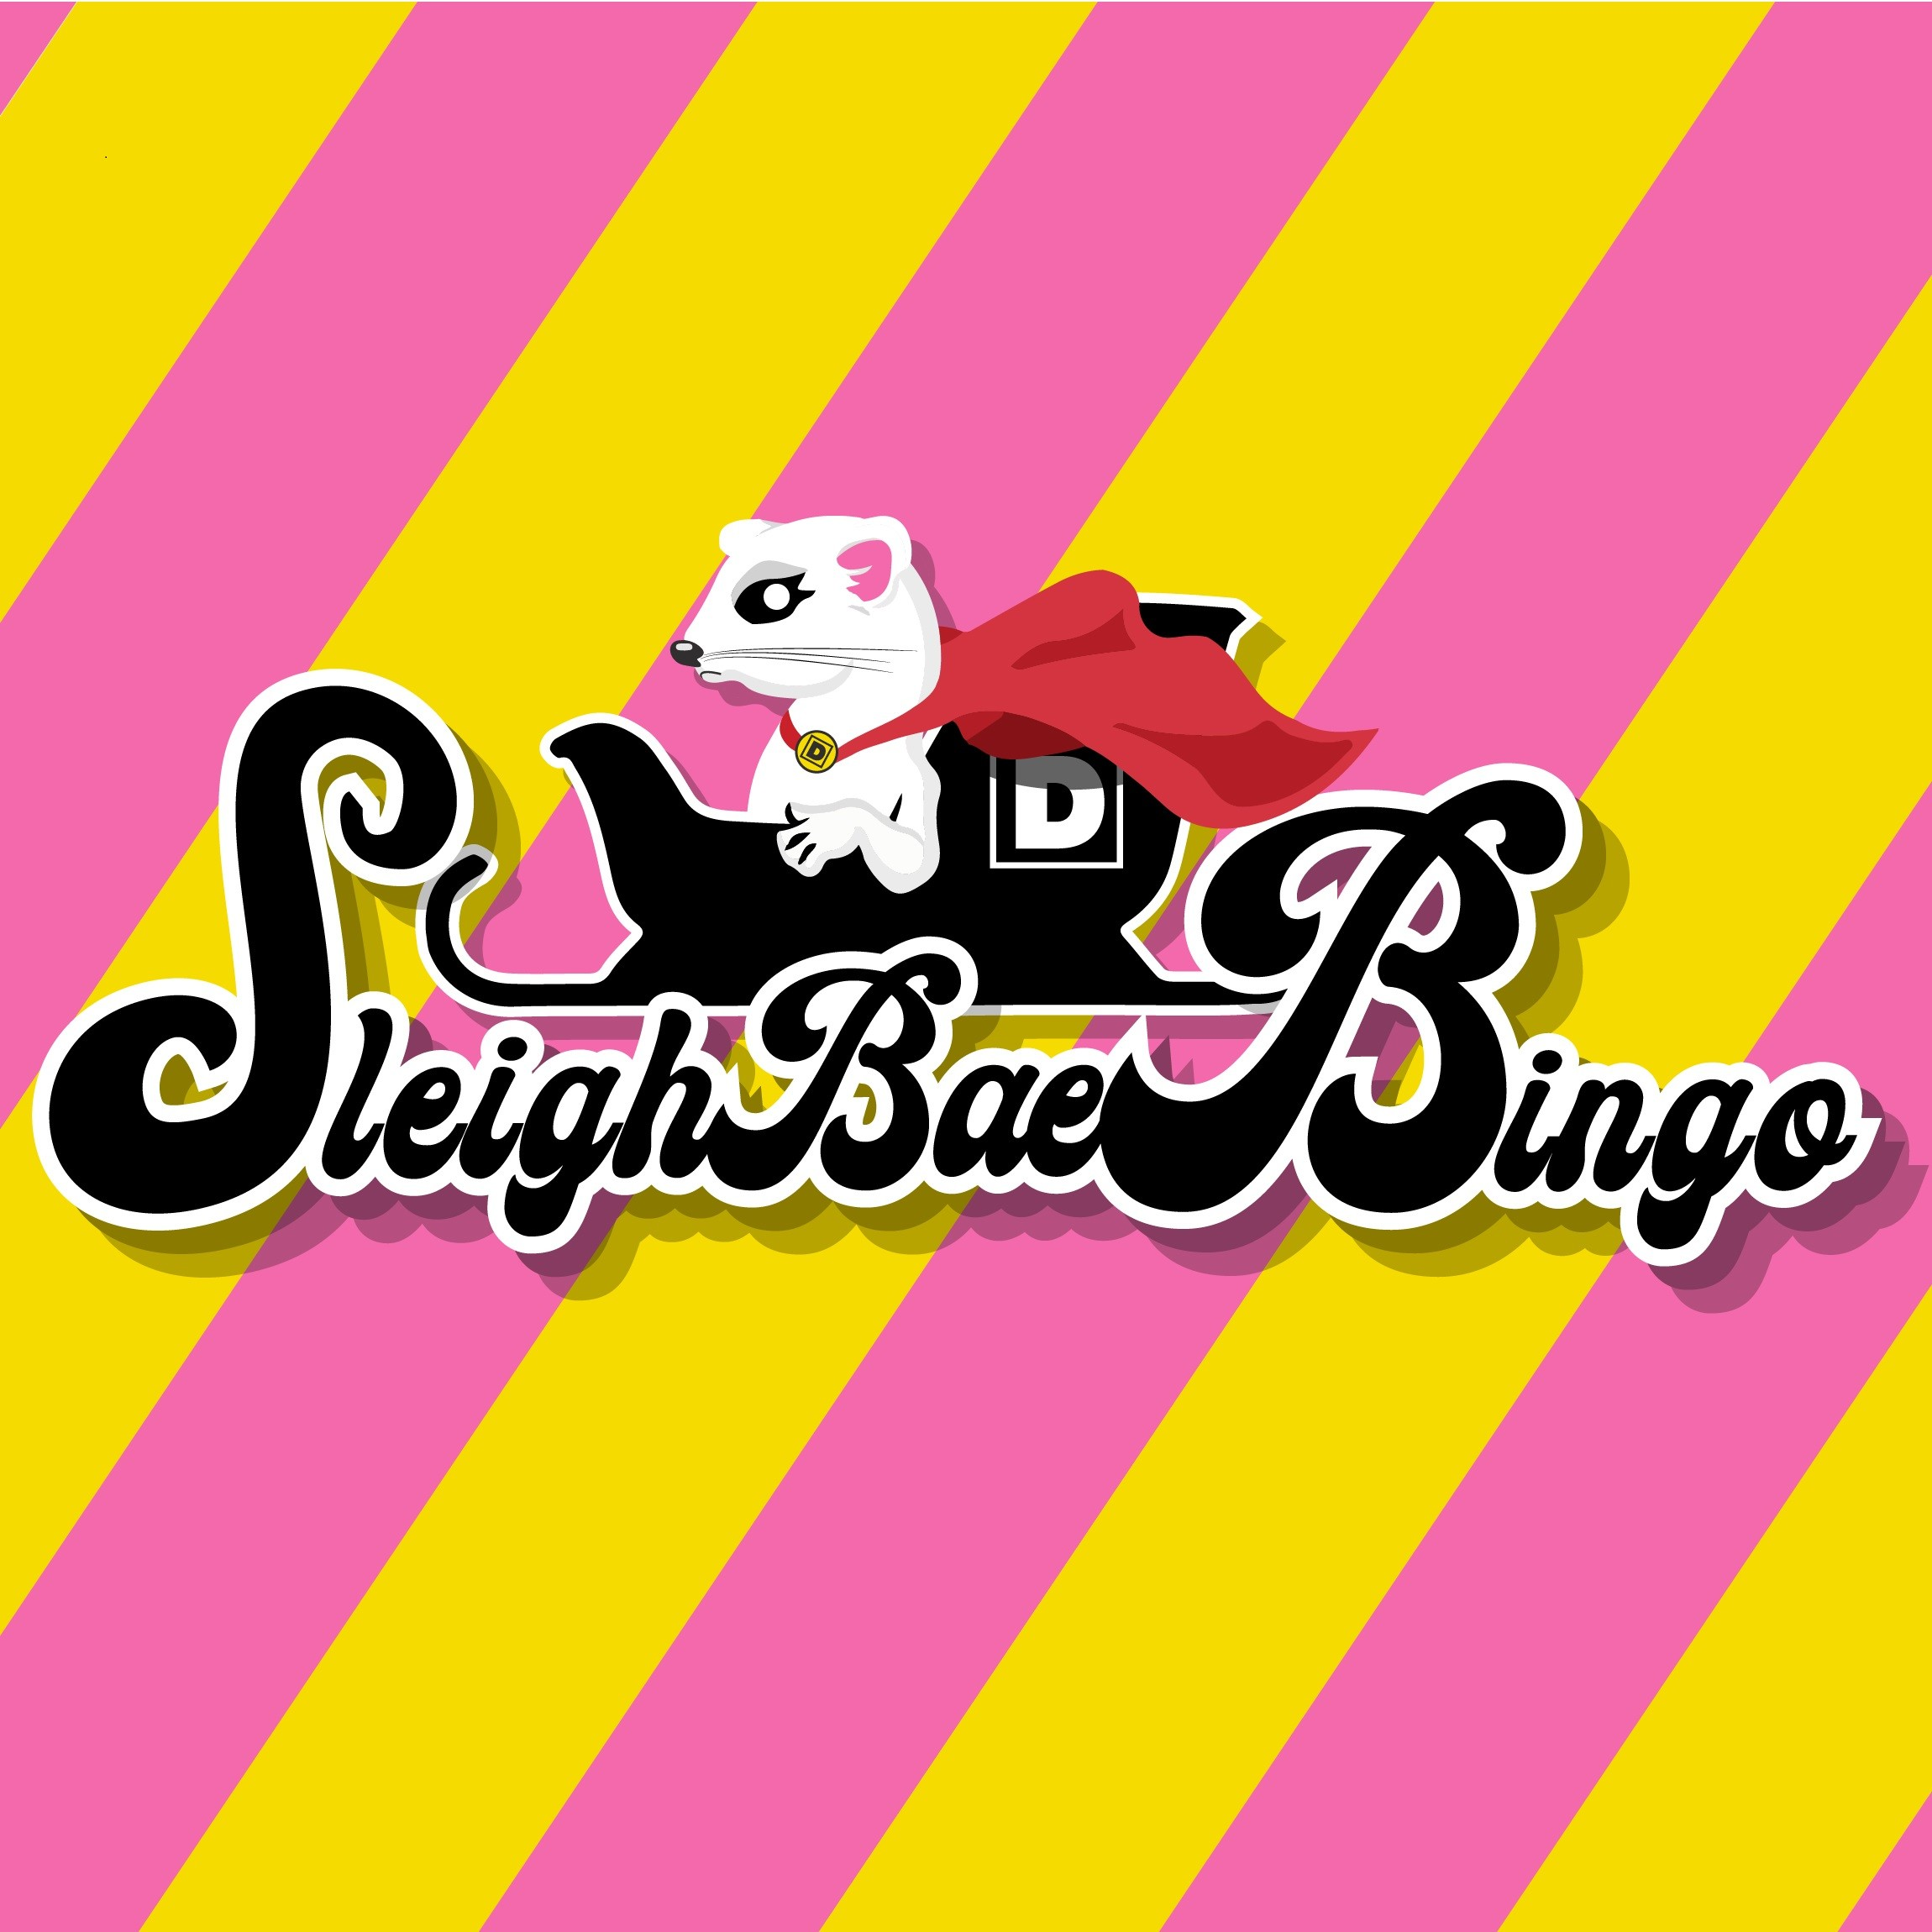 Sleigh Bae Bingo - Christmas Special